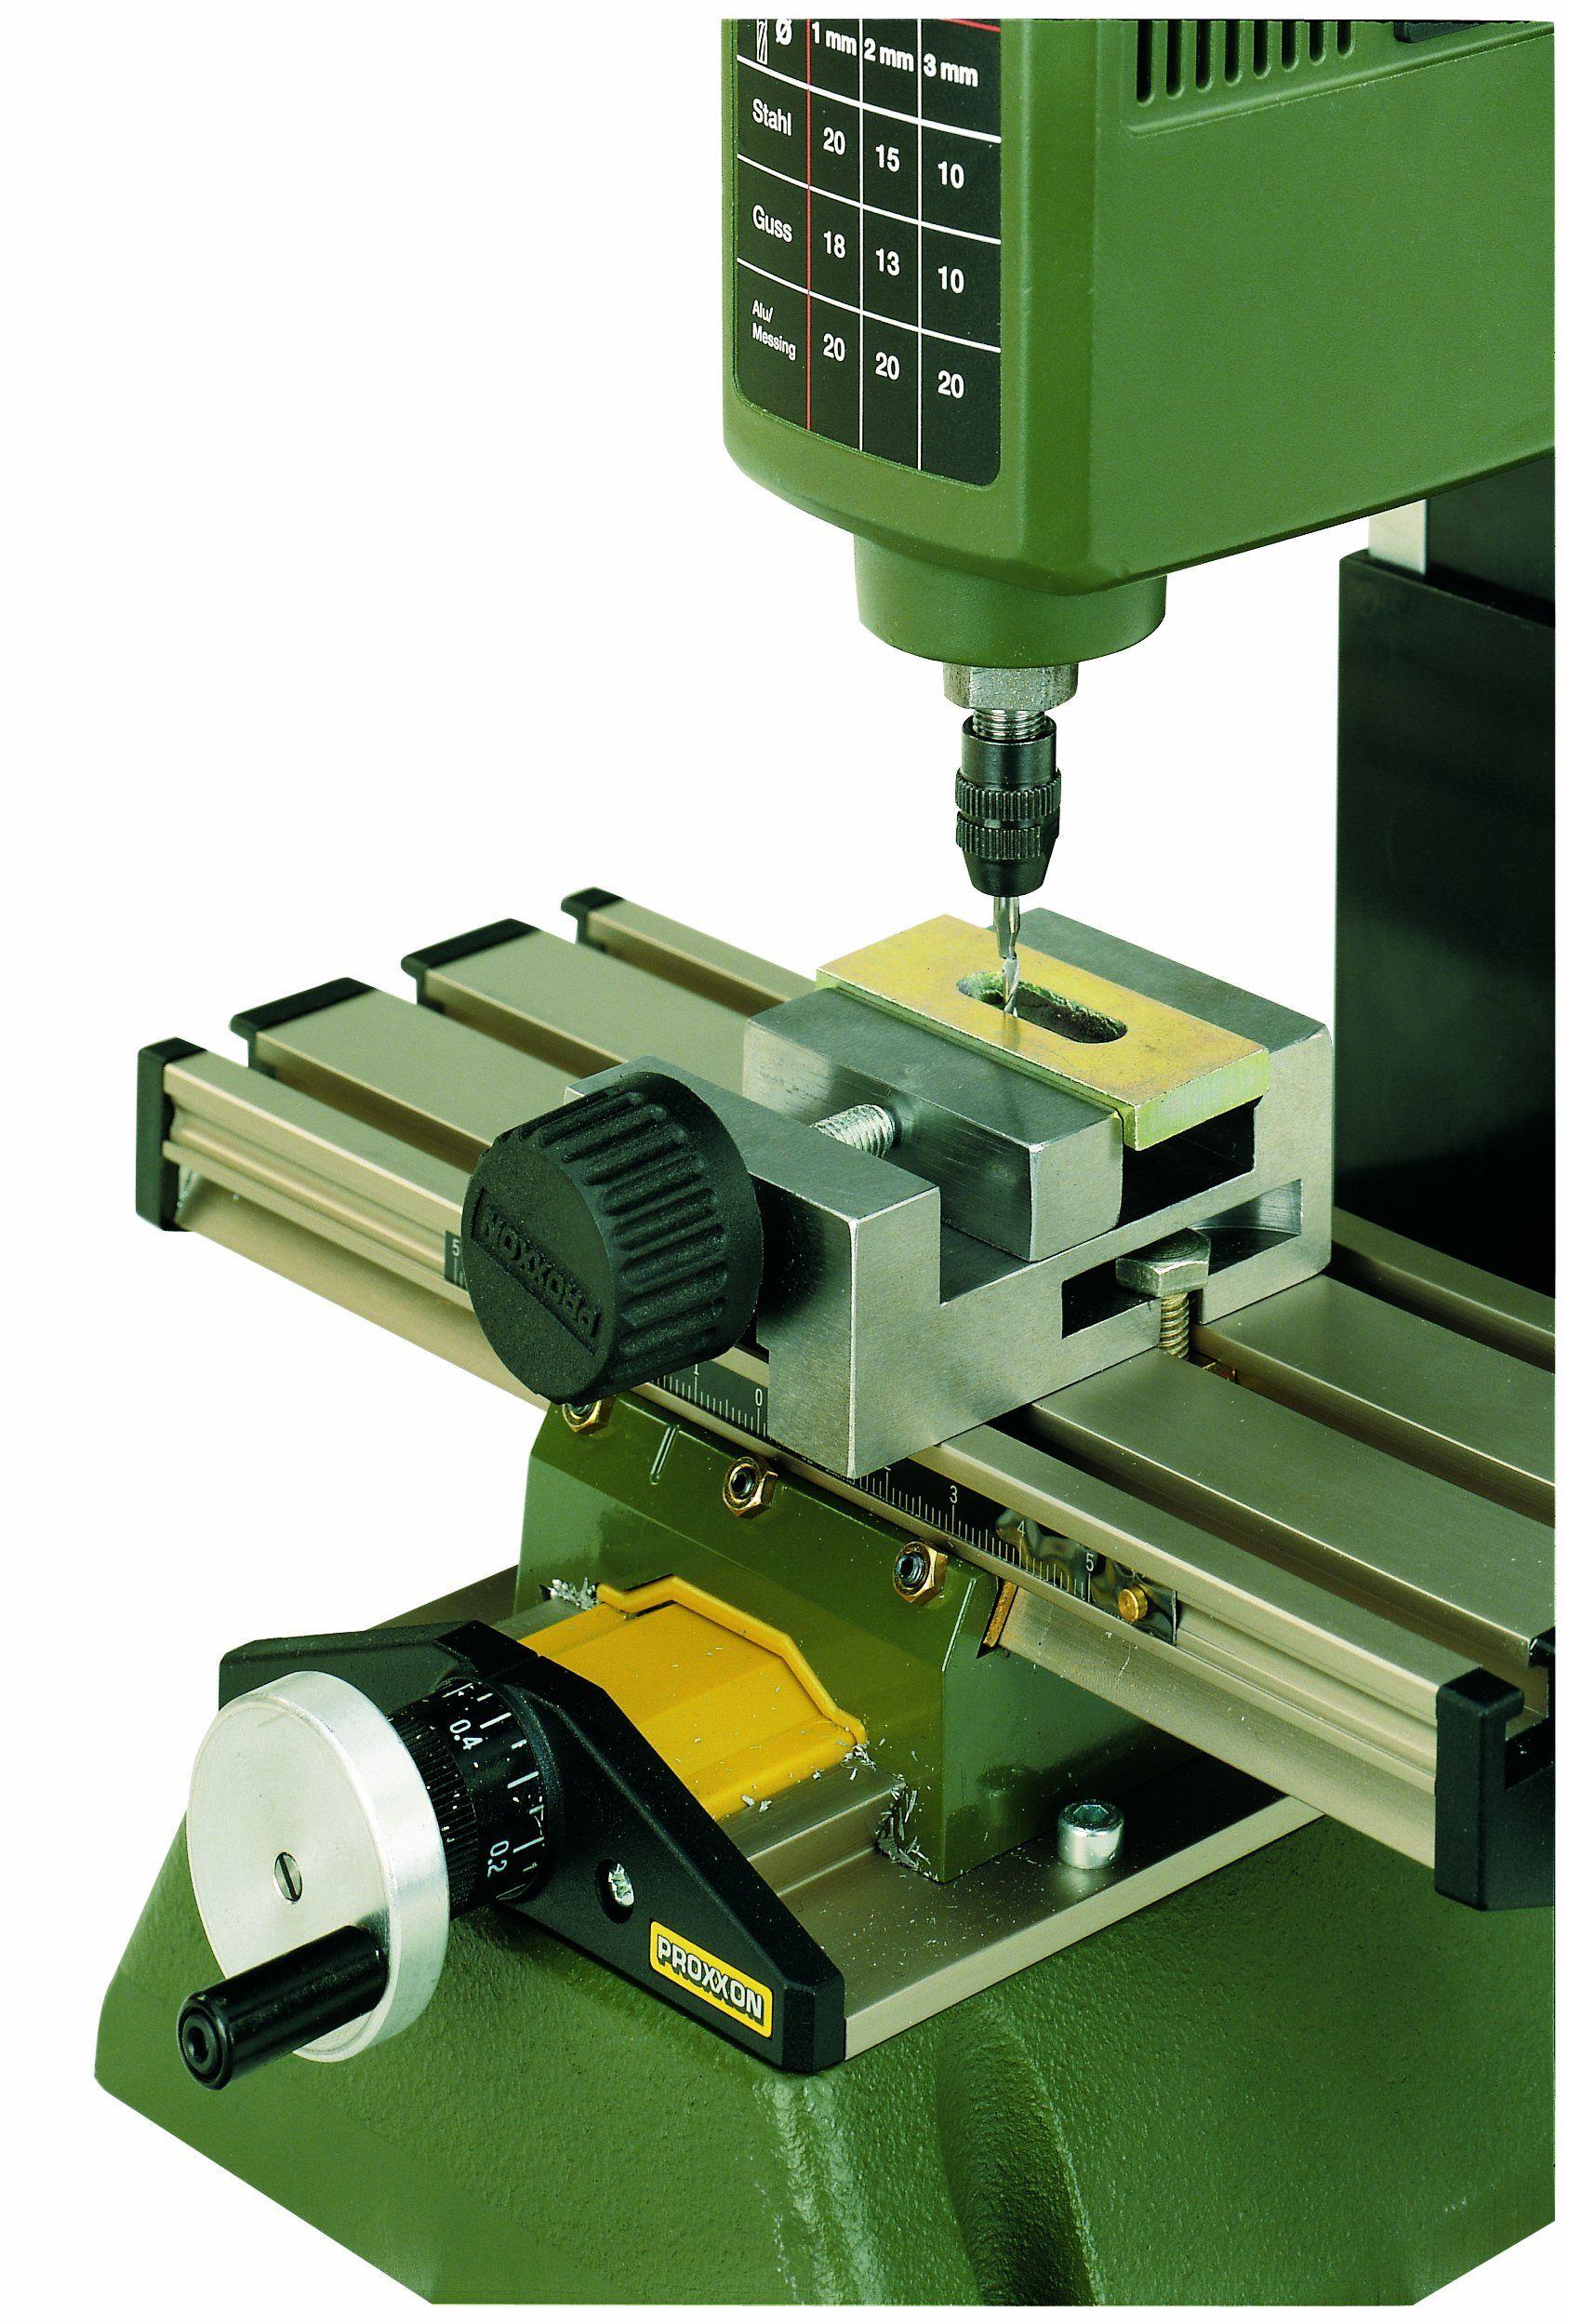 Amazon Com Proxxon 24260 Precision Machine Vise For Mf 70 Home Improvement Best Portable Air Compressor Machine Milling Machine For Sale